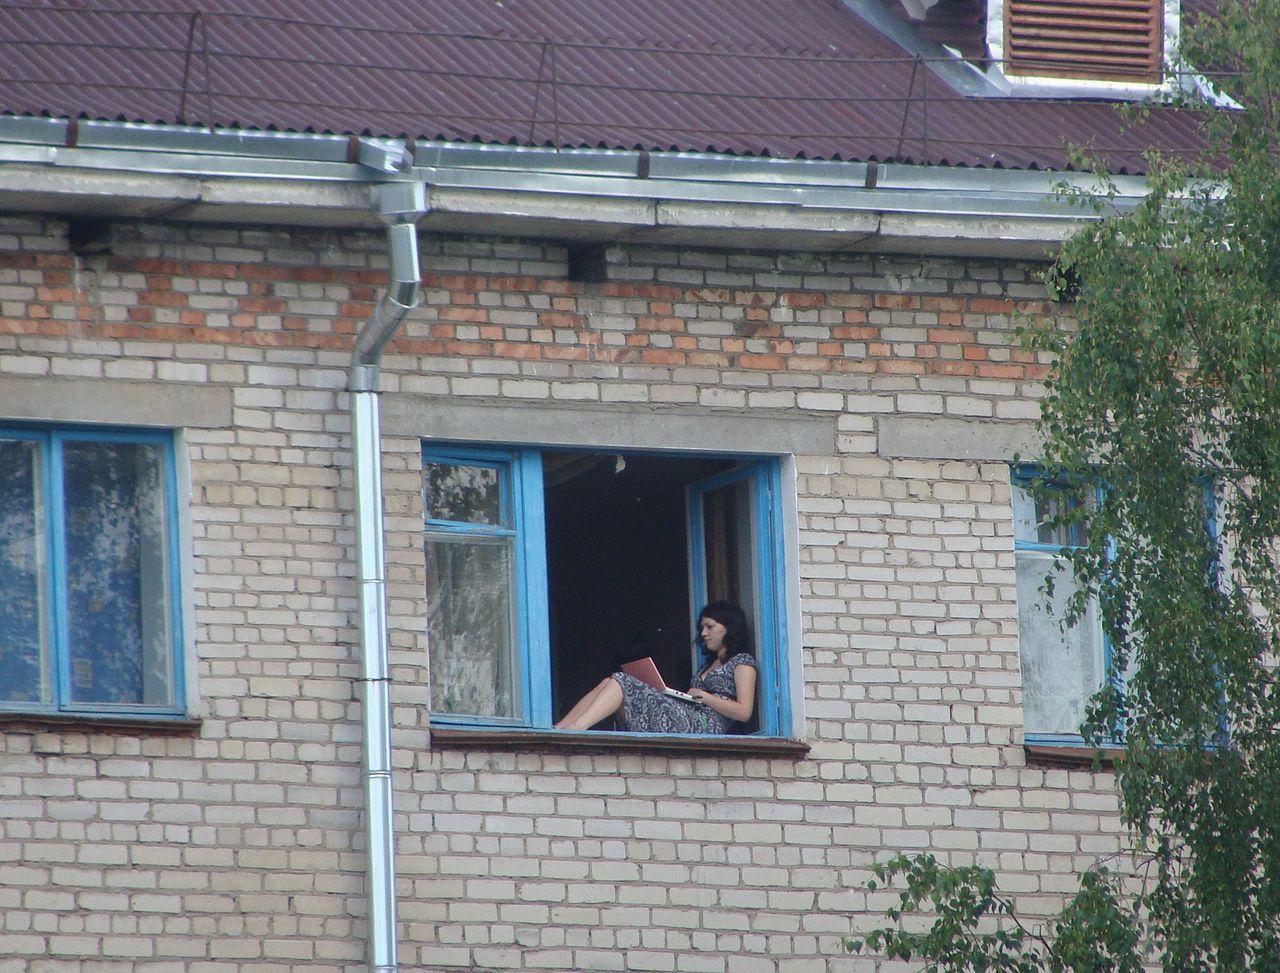 File:Girl Sitting On The Windowsill.JPG